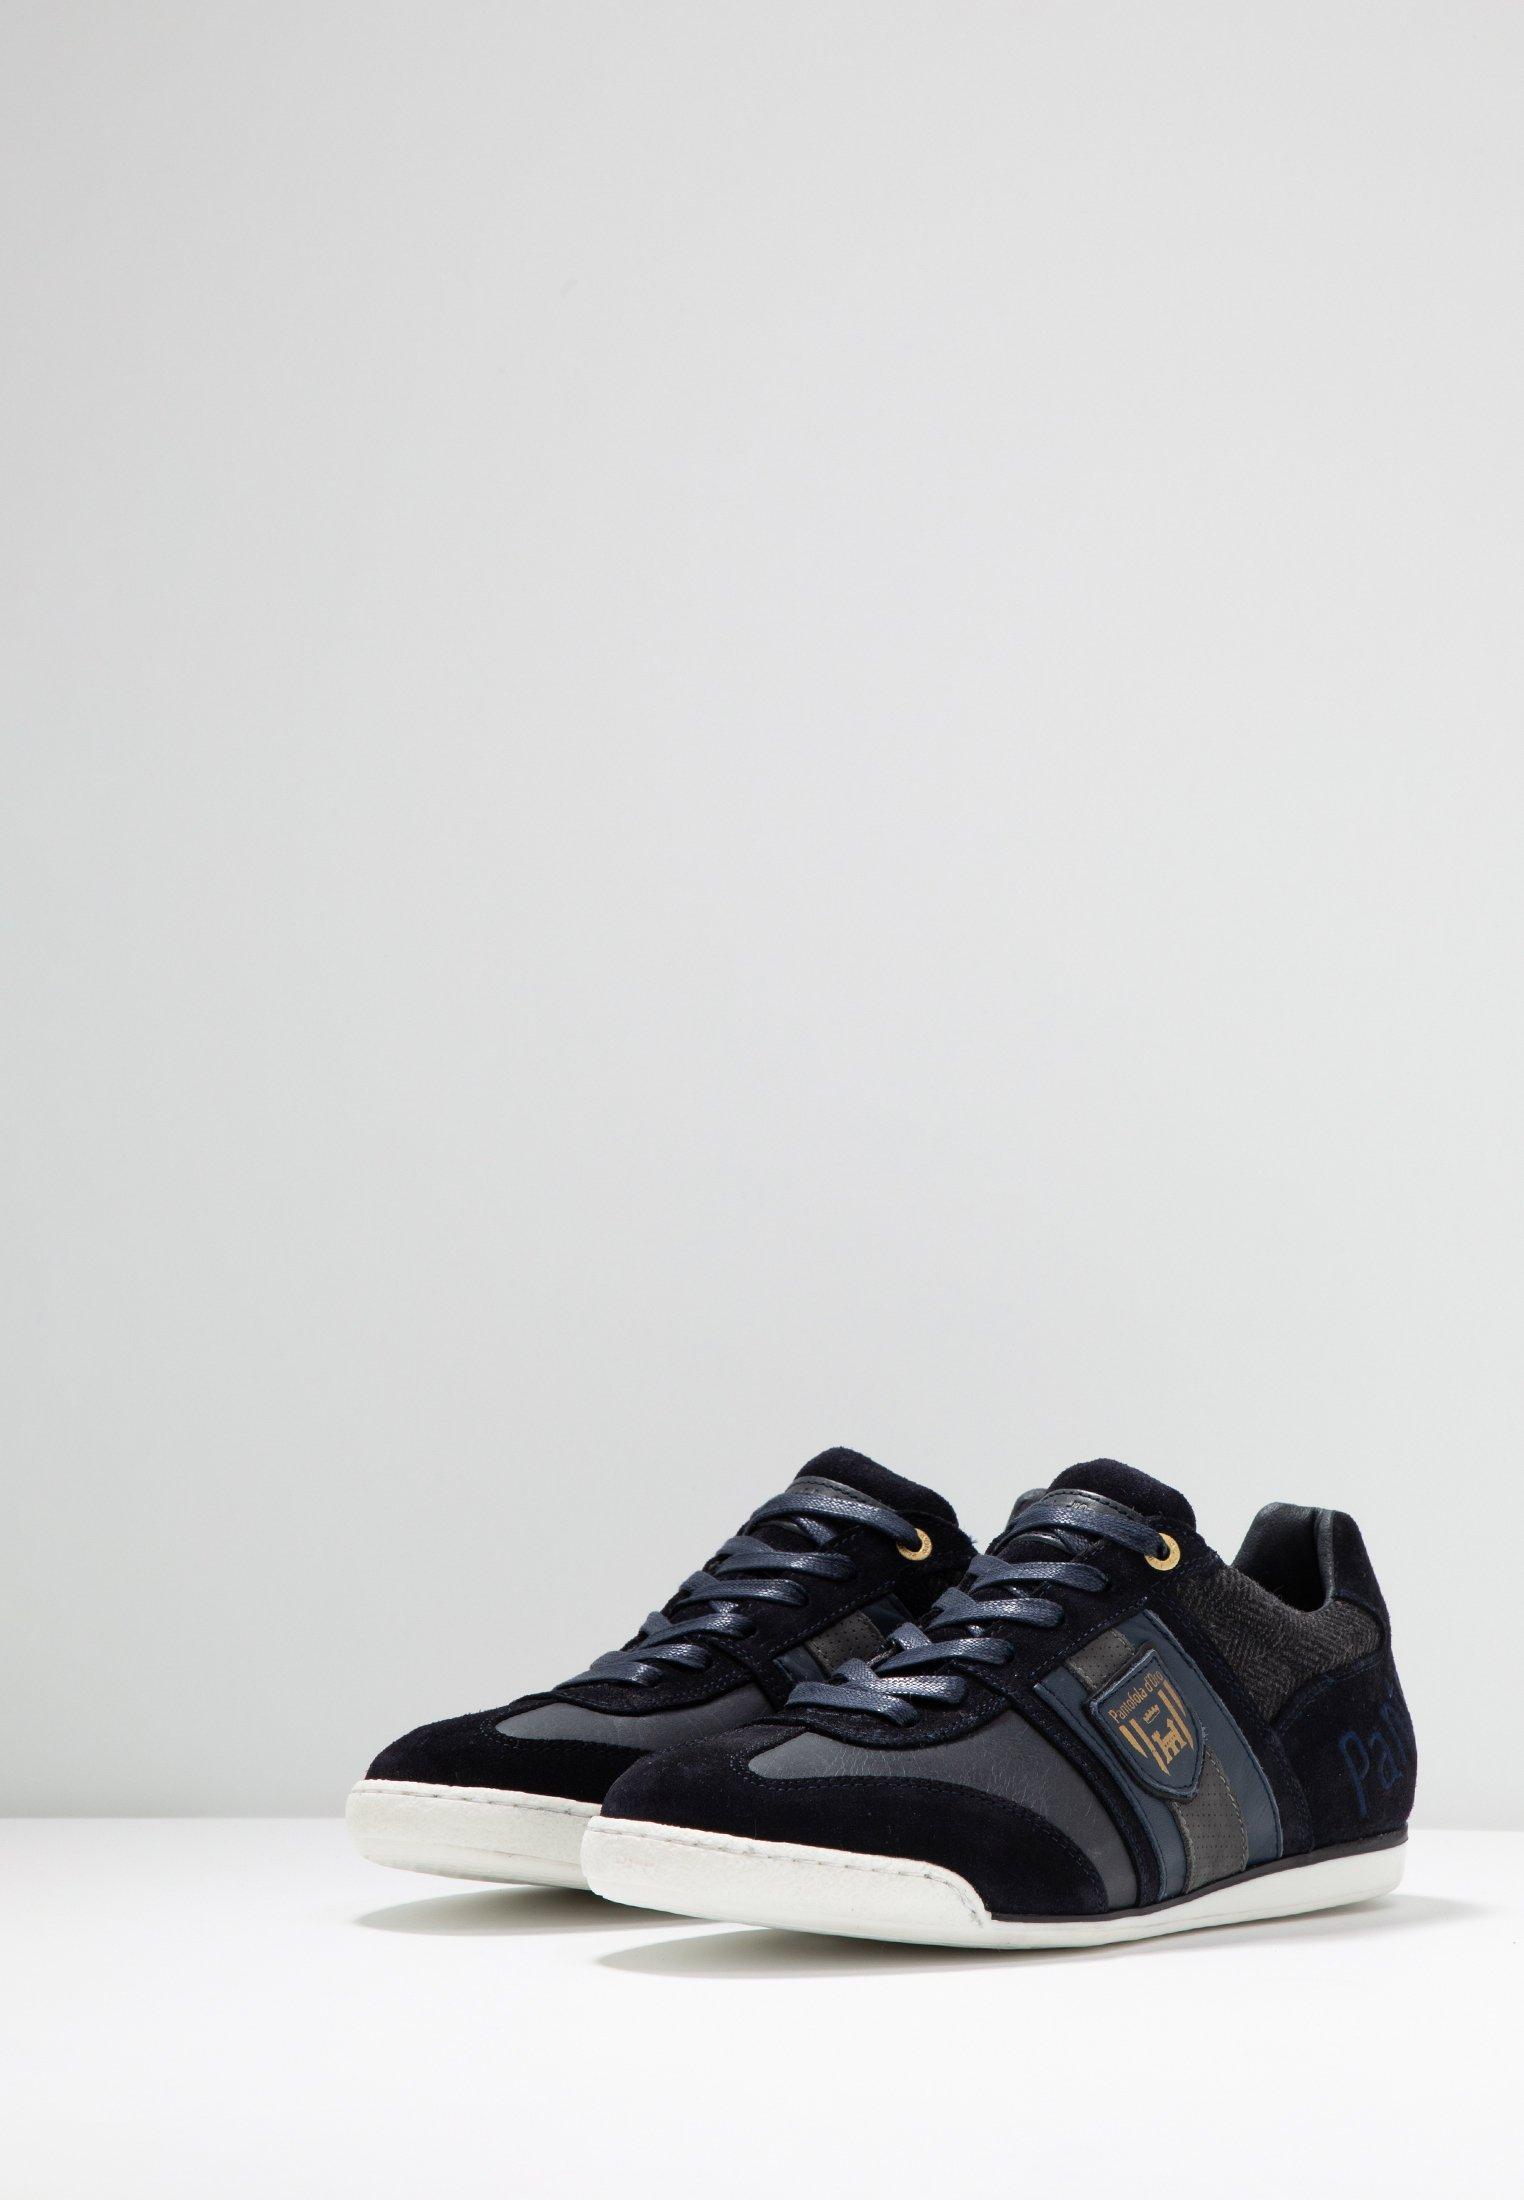 Basses Dress D`oro UomoBaskets Imola Pantofola Winter Blues Scudo jA54LR3